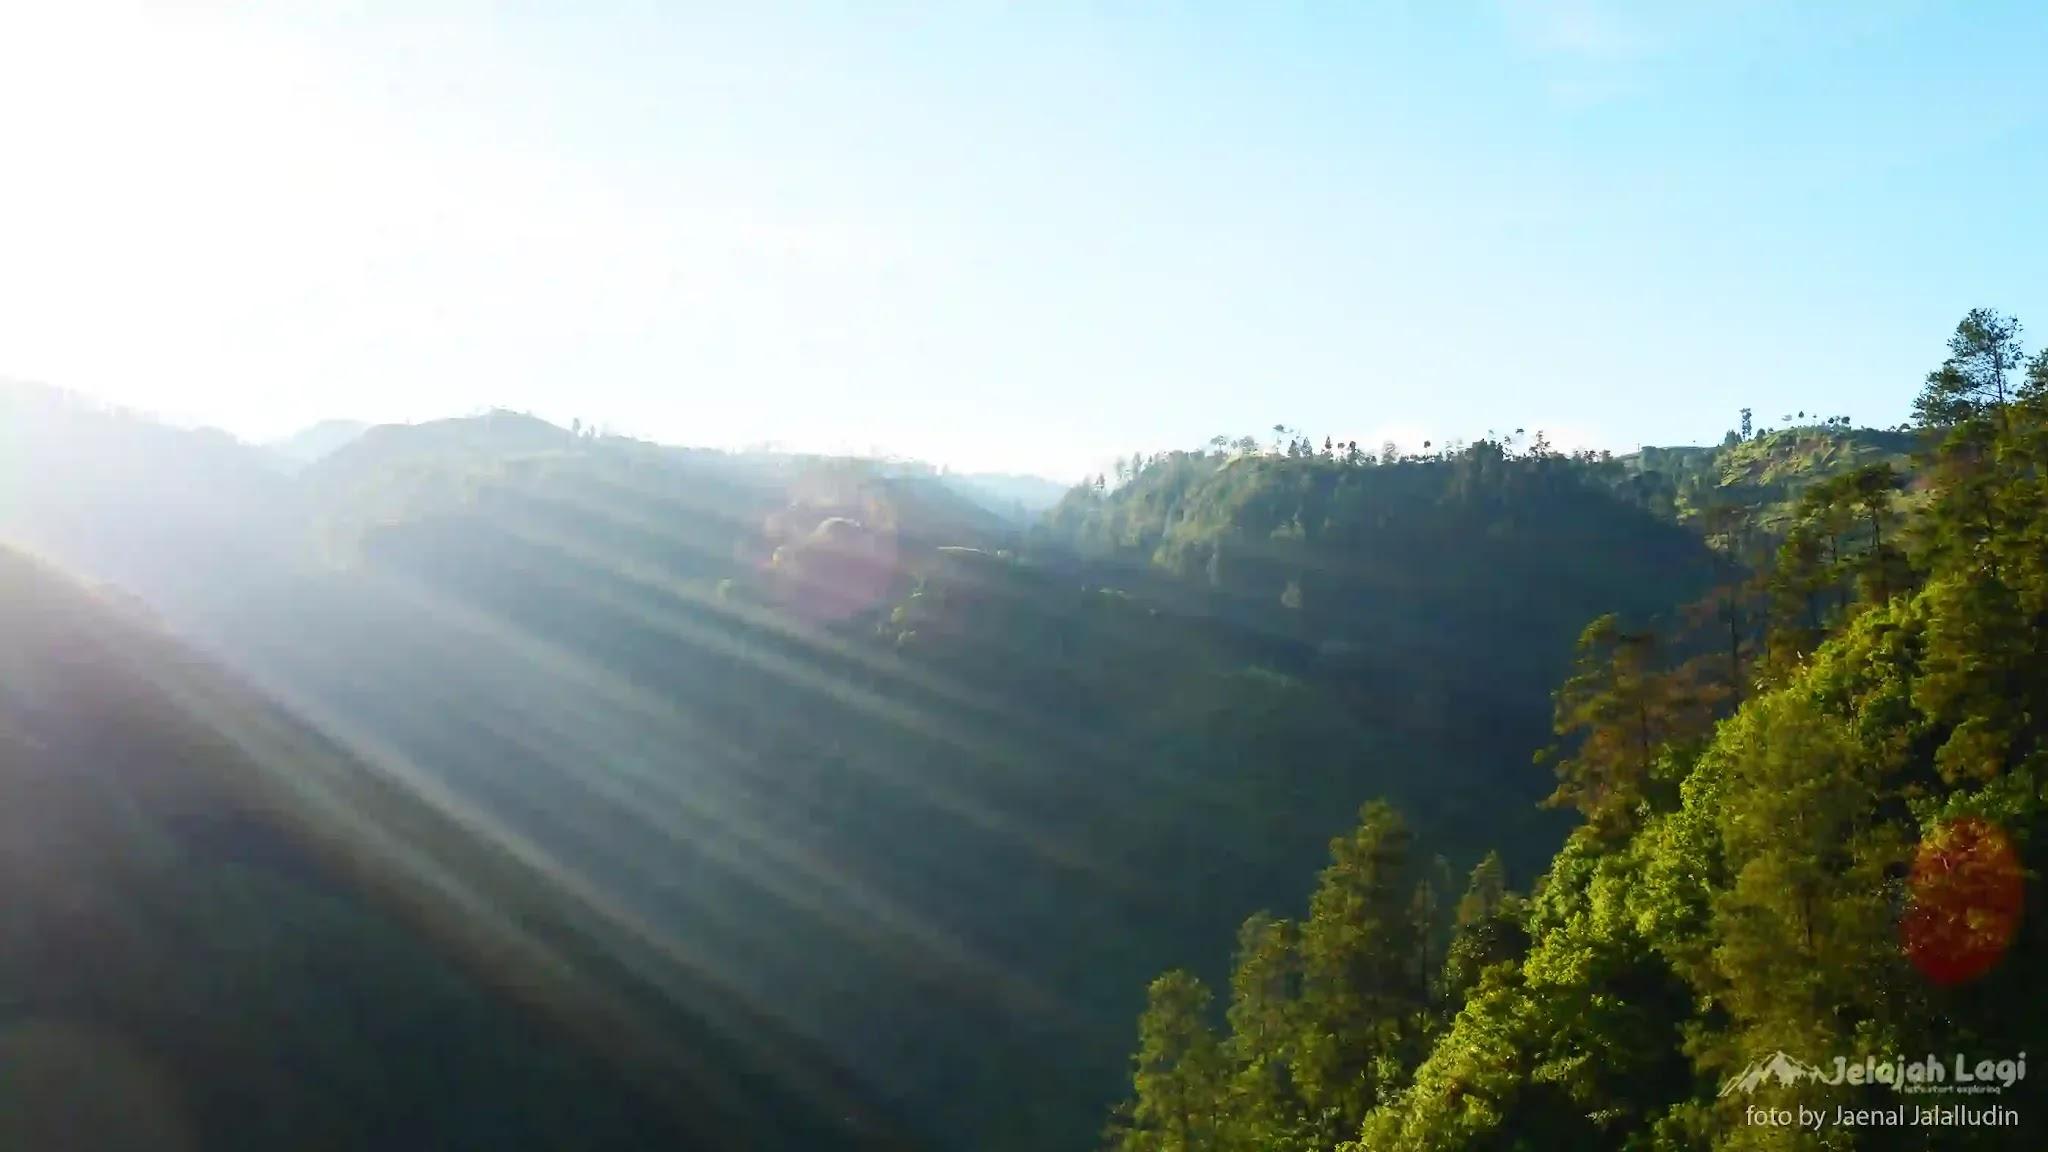 Ray of Light Waru Doyong Brebes Jawa Tengah - Foto by Jaenal Jalalludin Jelajah Lagi Team